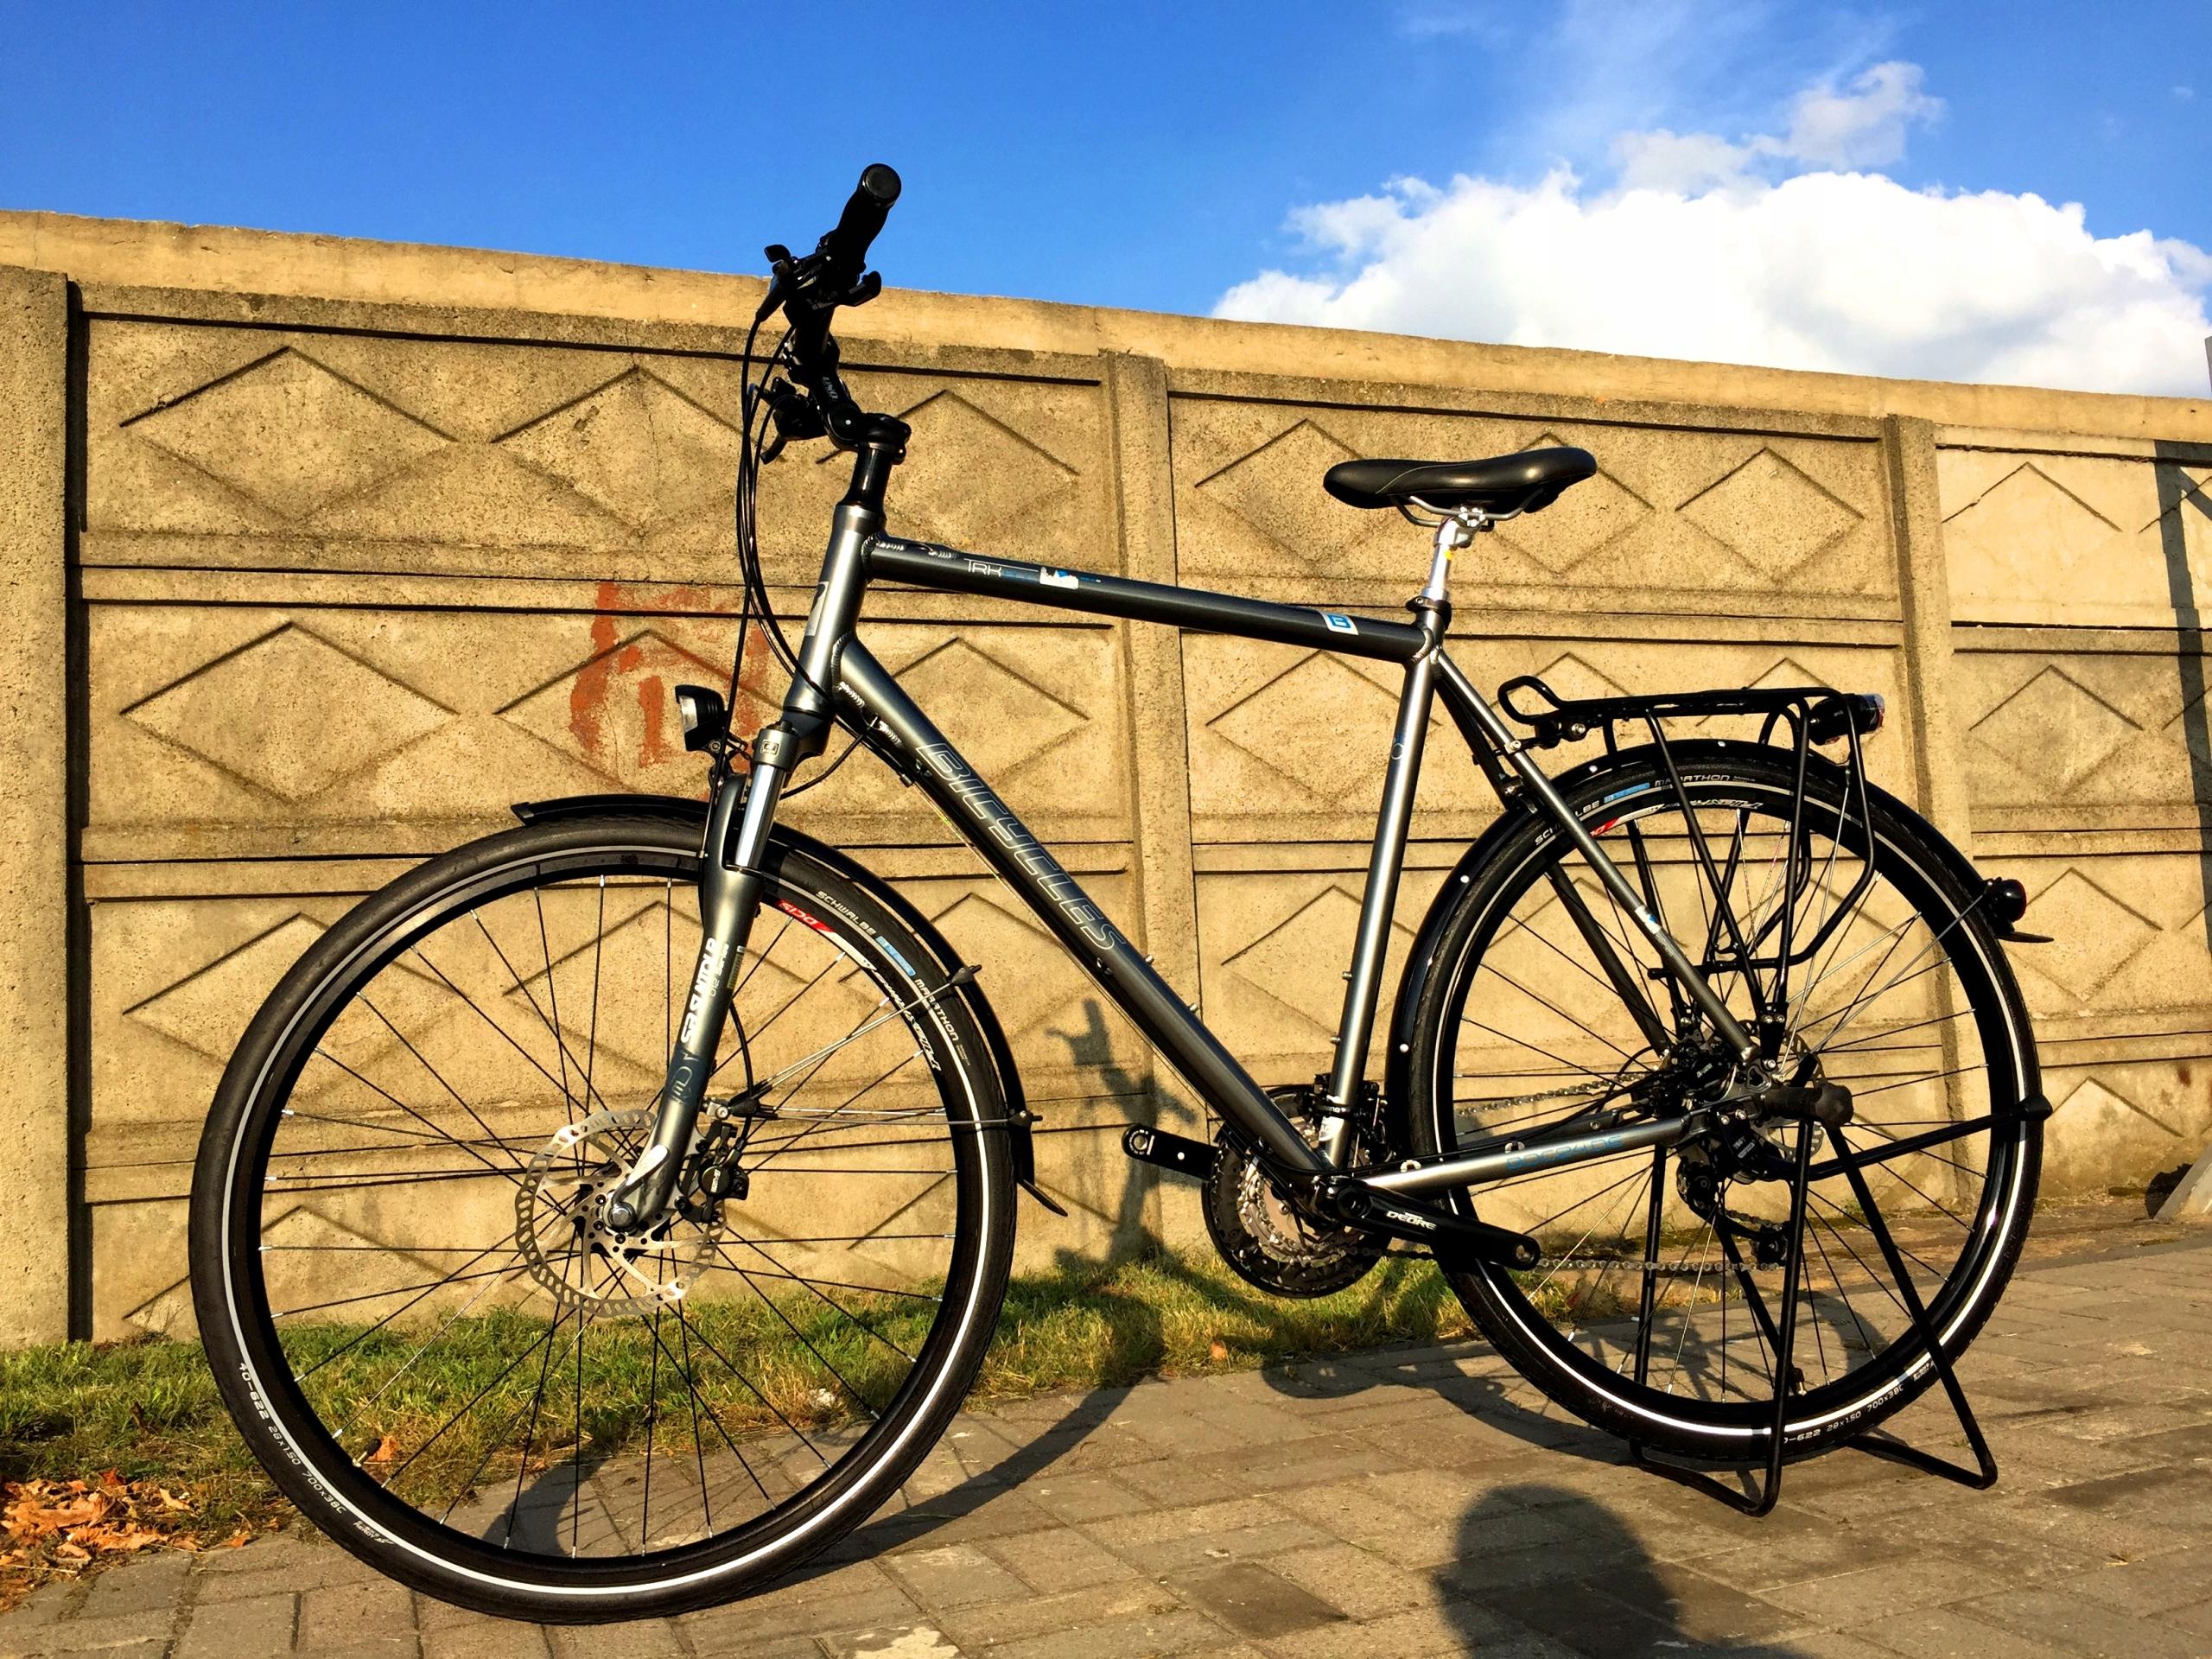 NÓWKA BICYCLES TRK800 Full Shimano DEORE SLX XT